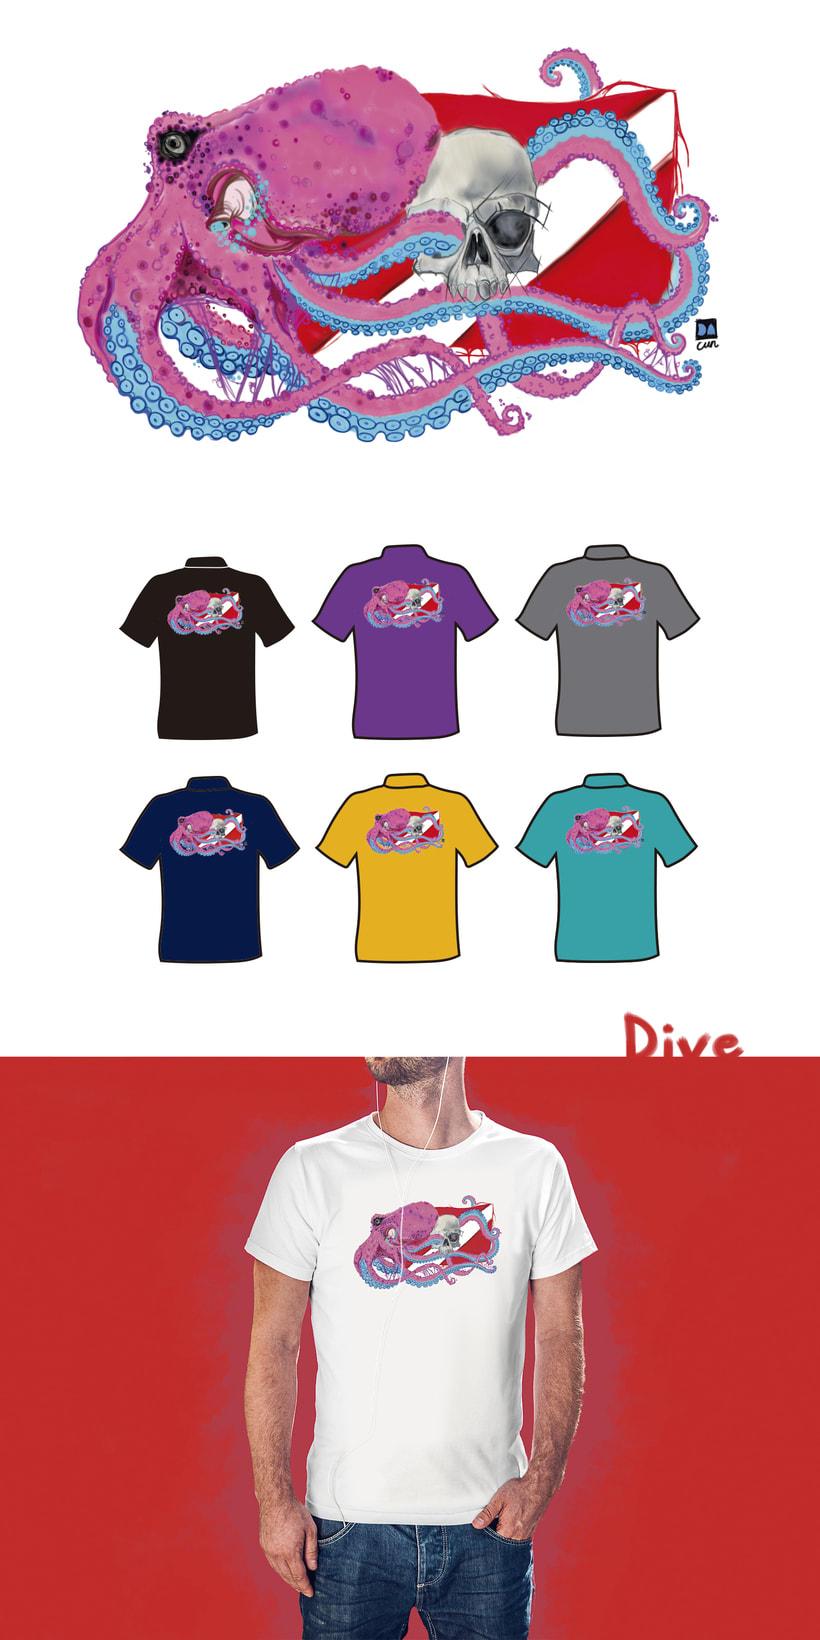 Diving clothes 0